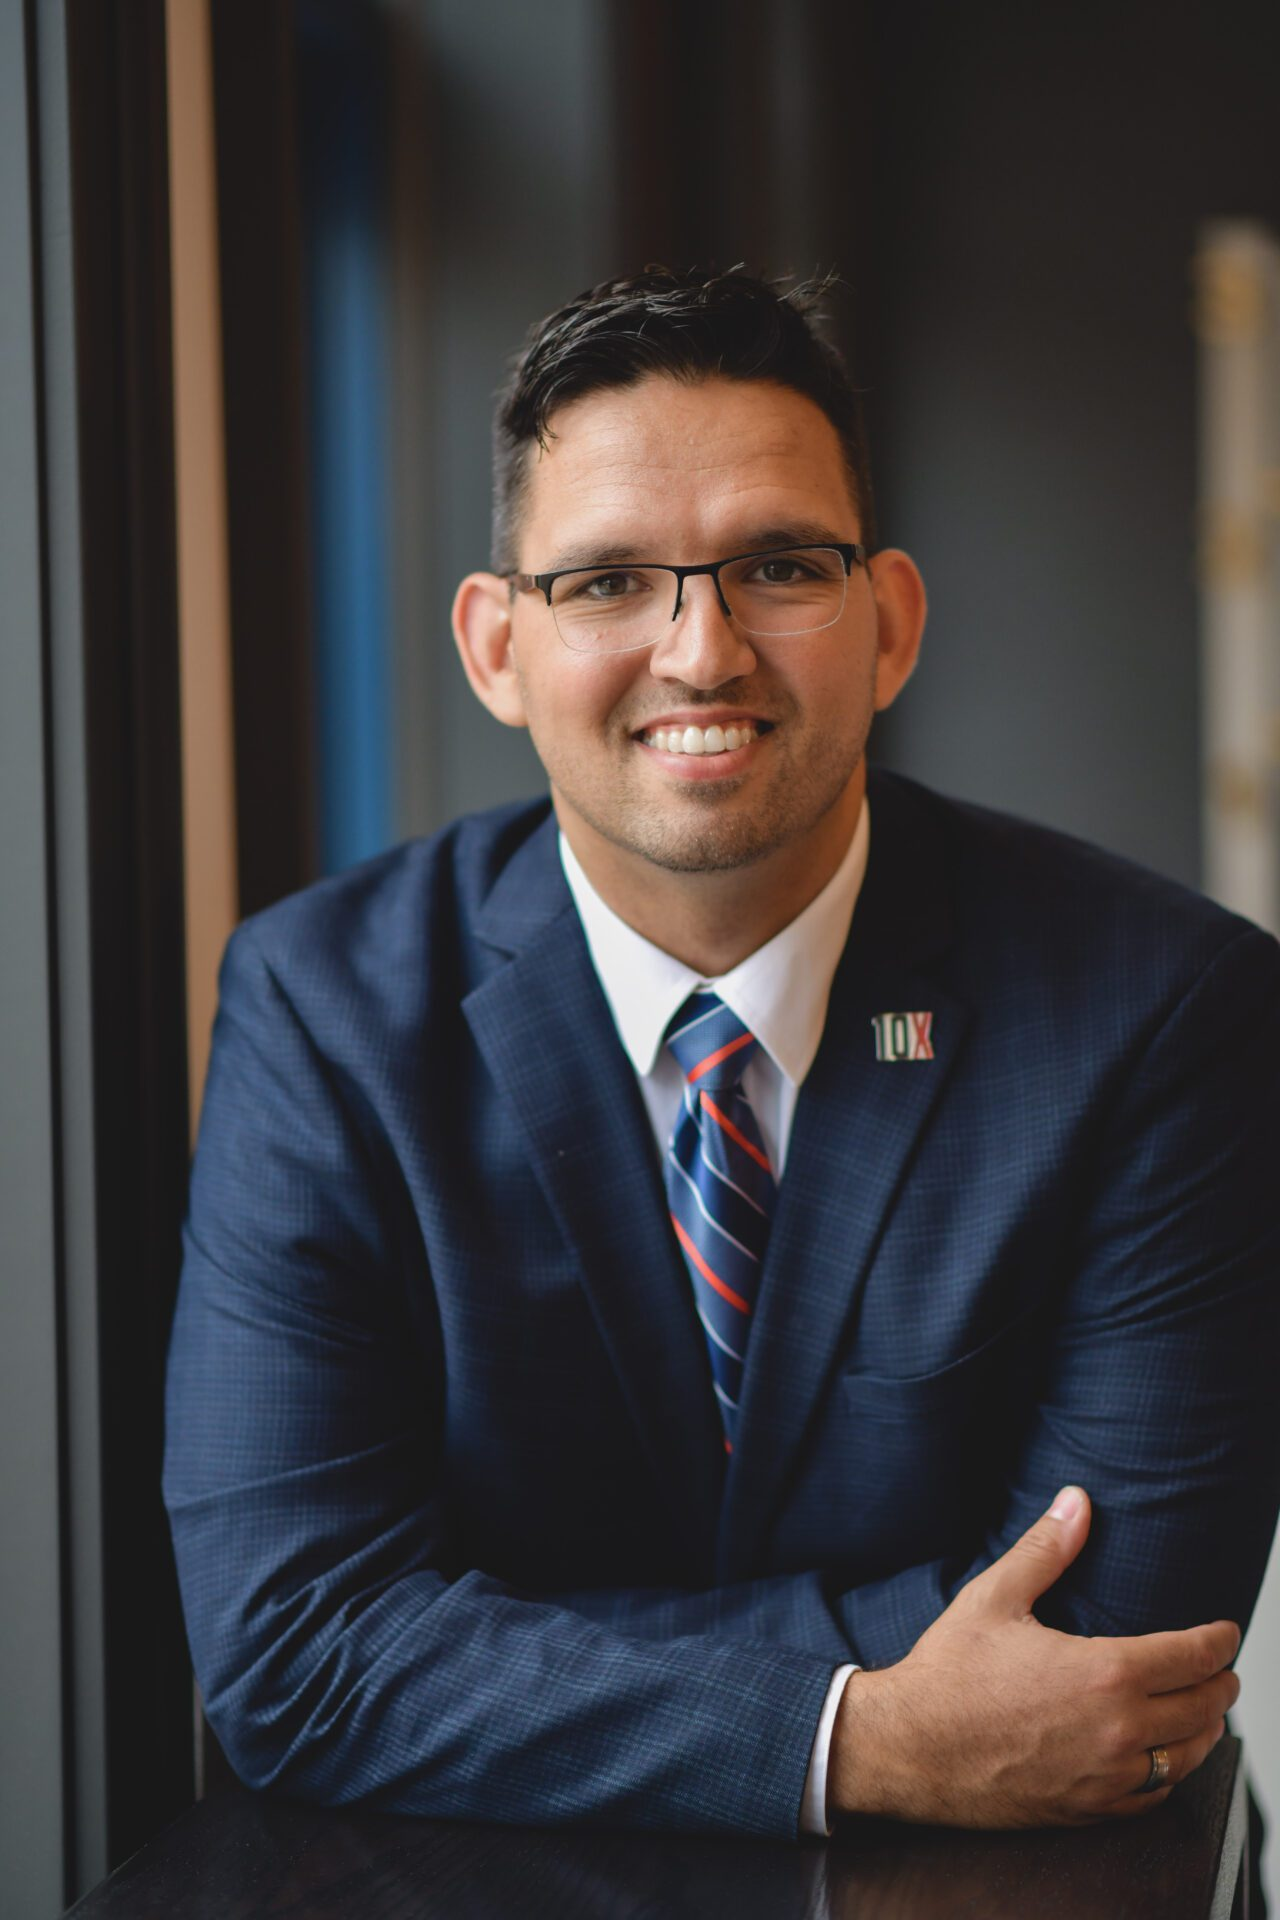 Brandon Garcia, owner BKXX Enterprises, LLC. a digital marketing agency